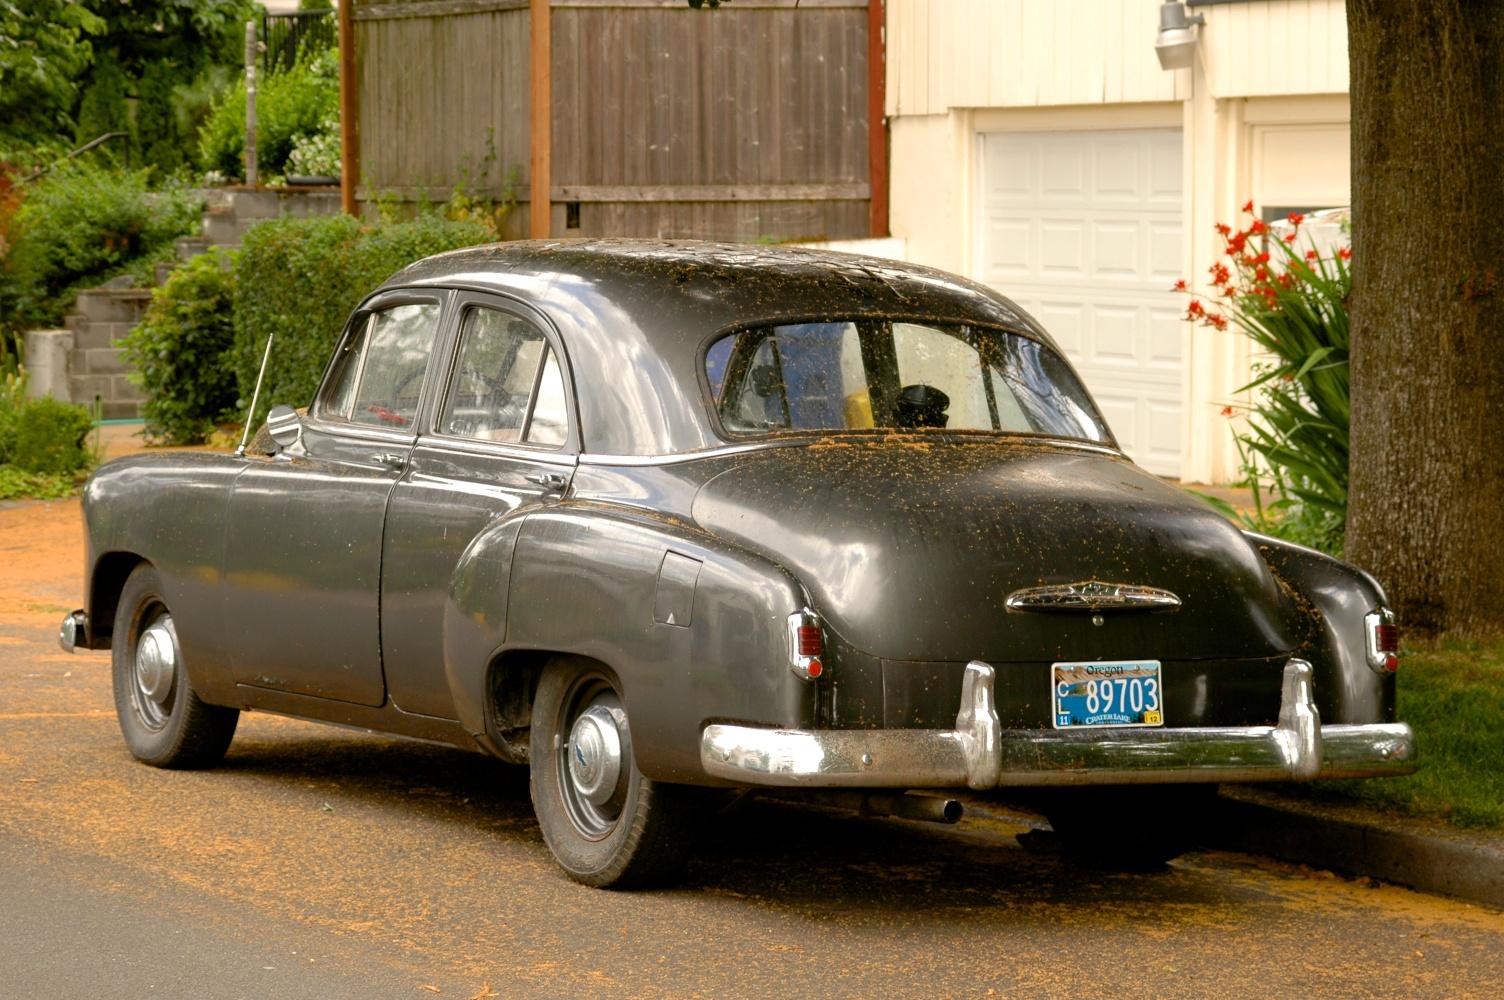 1951 Chevrolet Styleline Sedan.